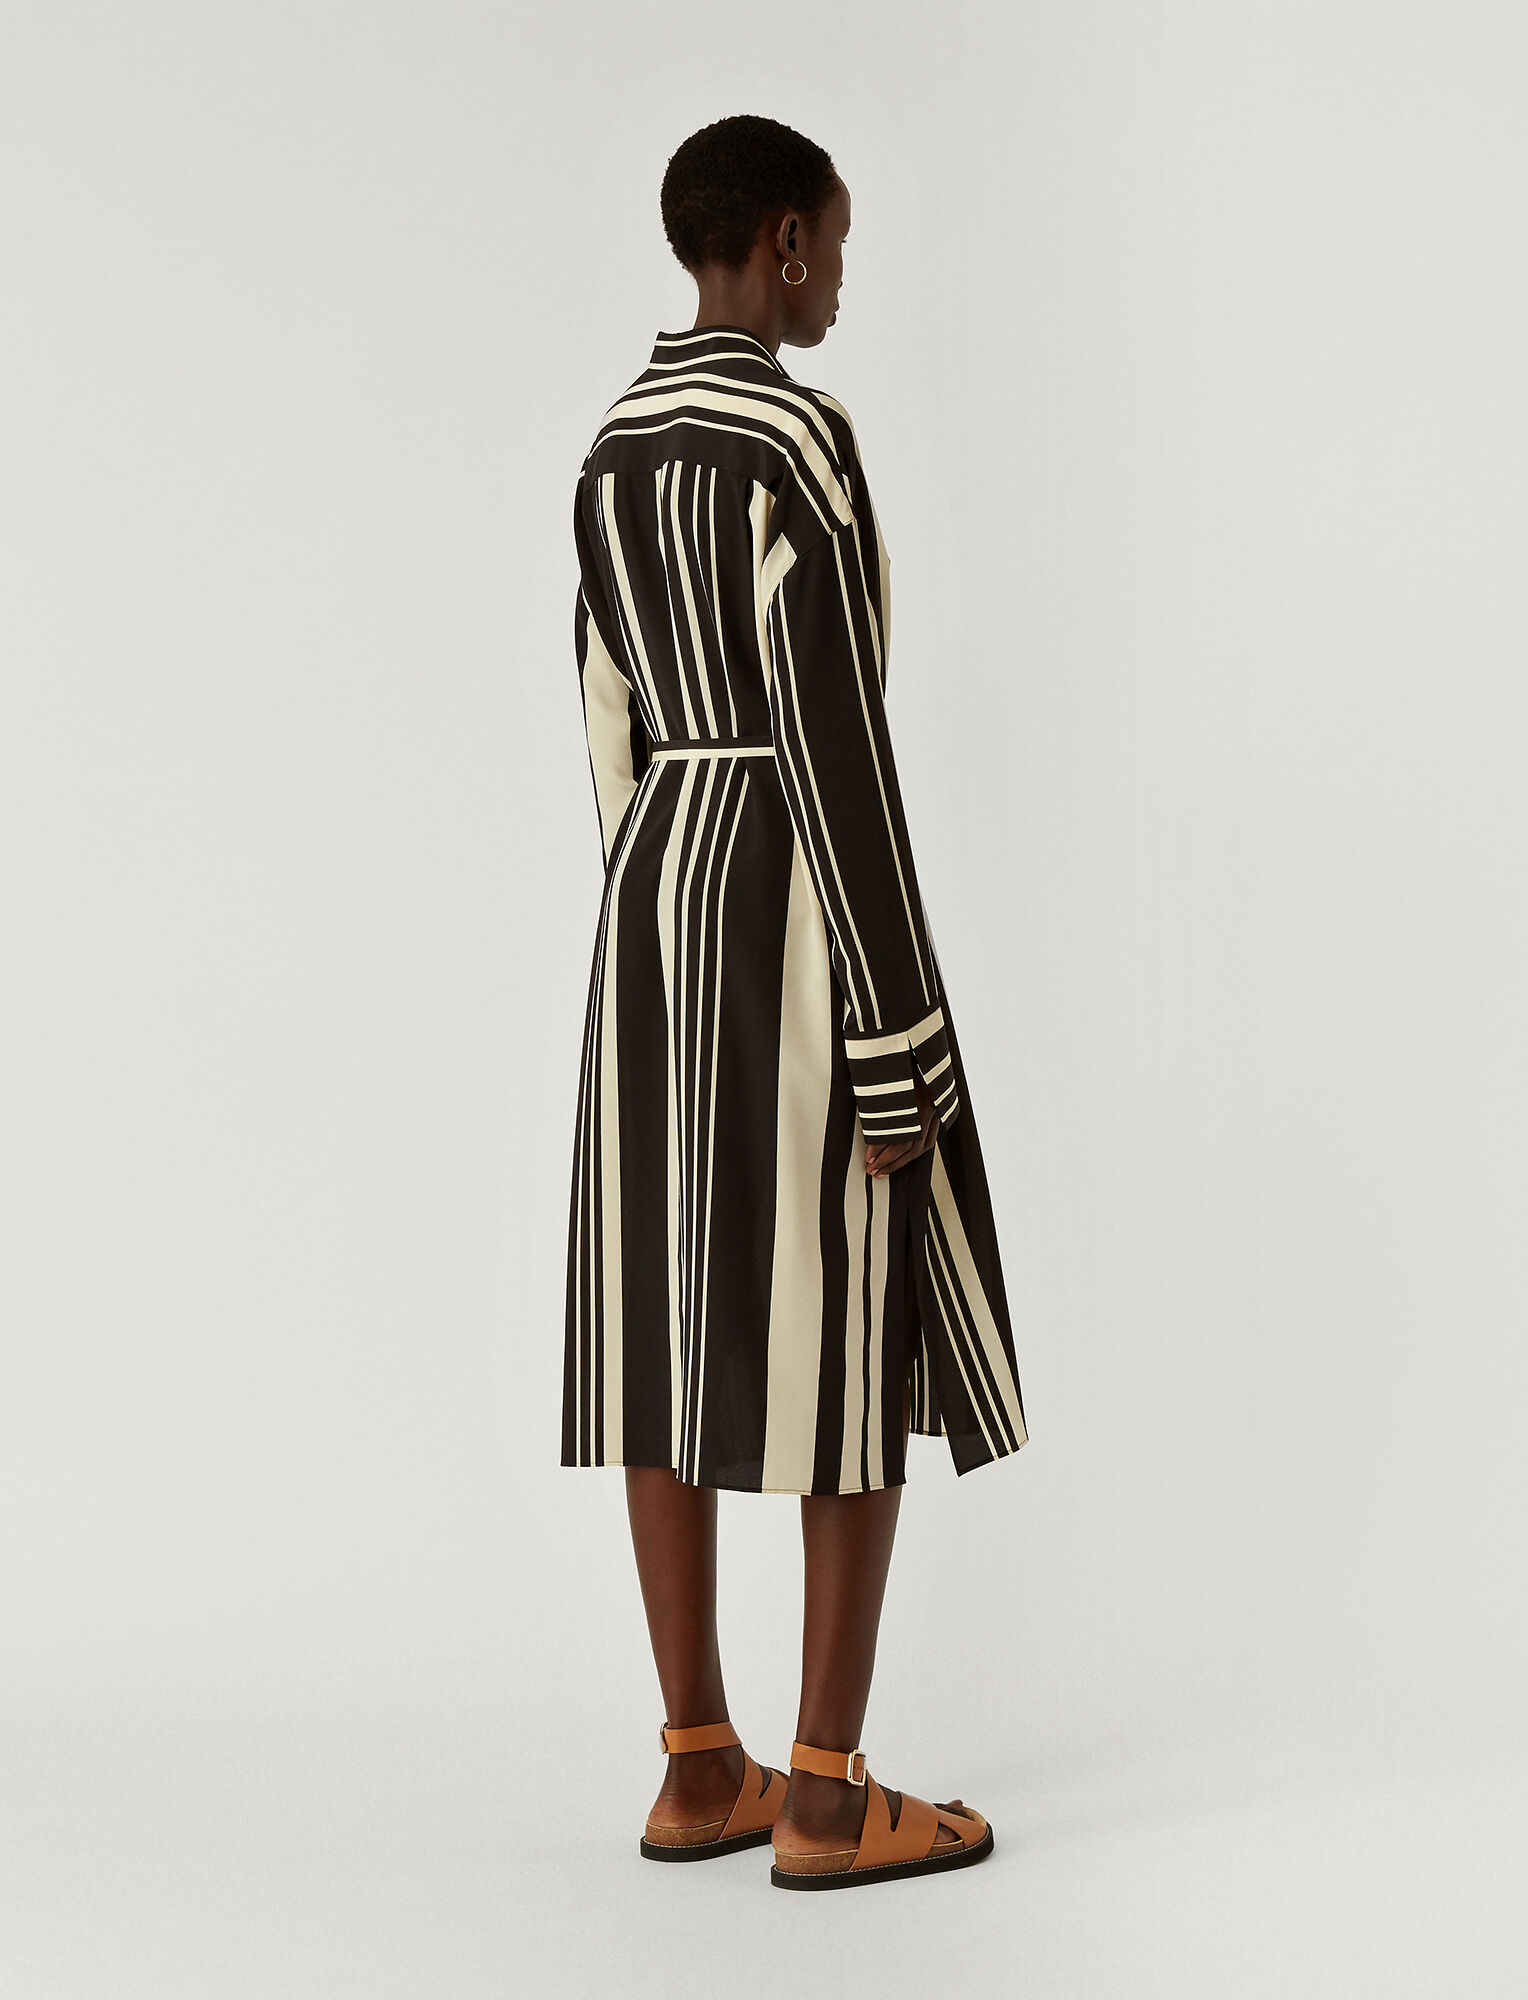 Joseph, Silk Stripes Duras Dress, in GREY/BLACK